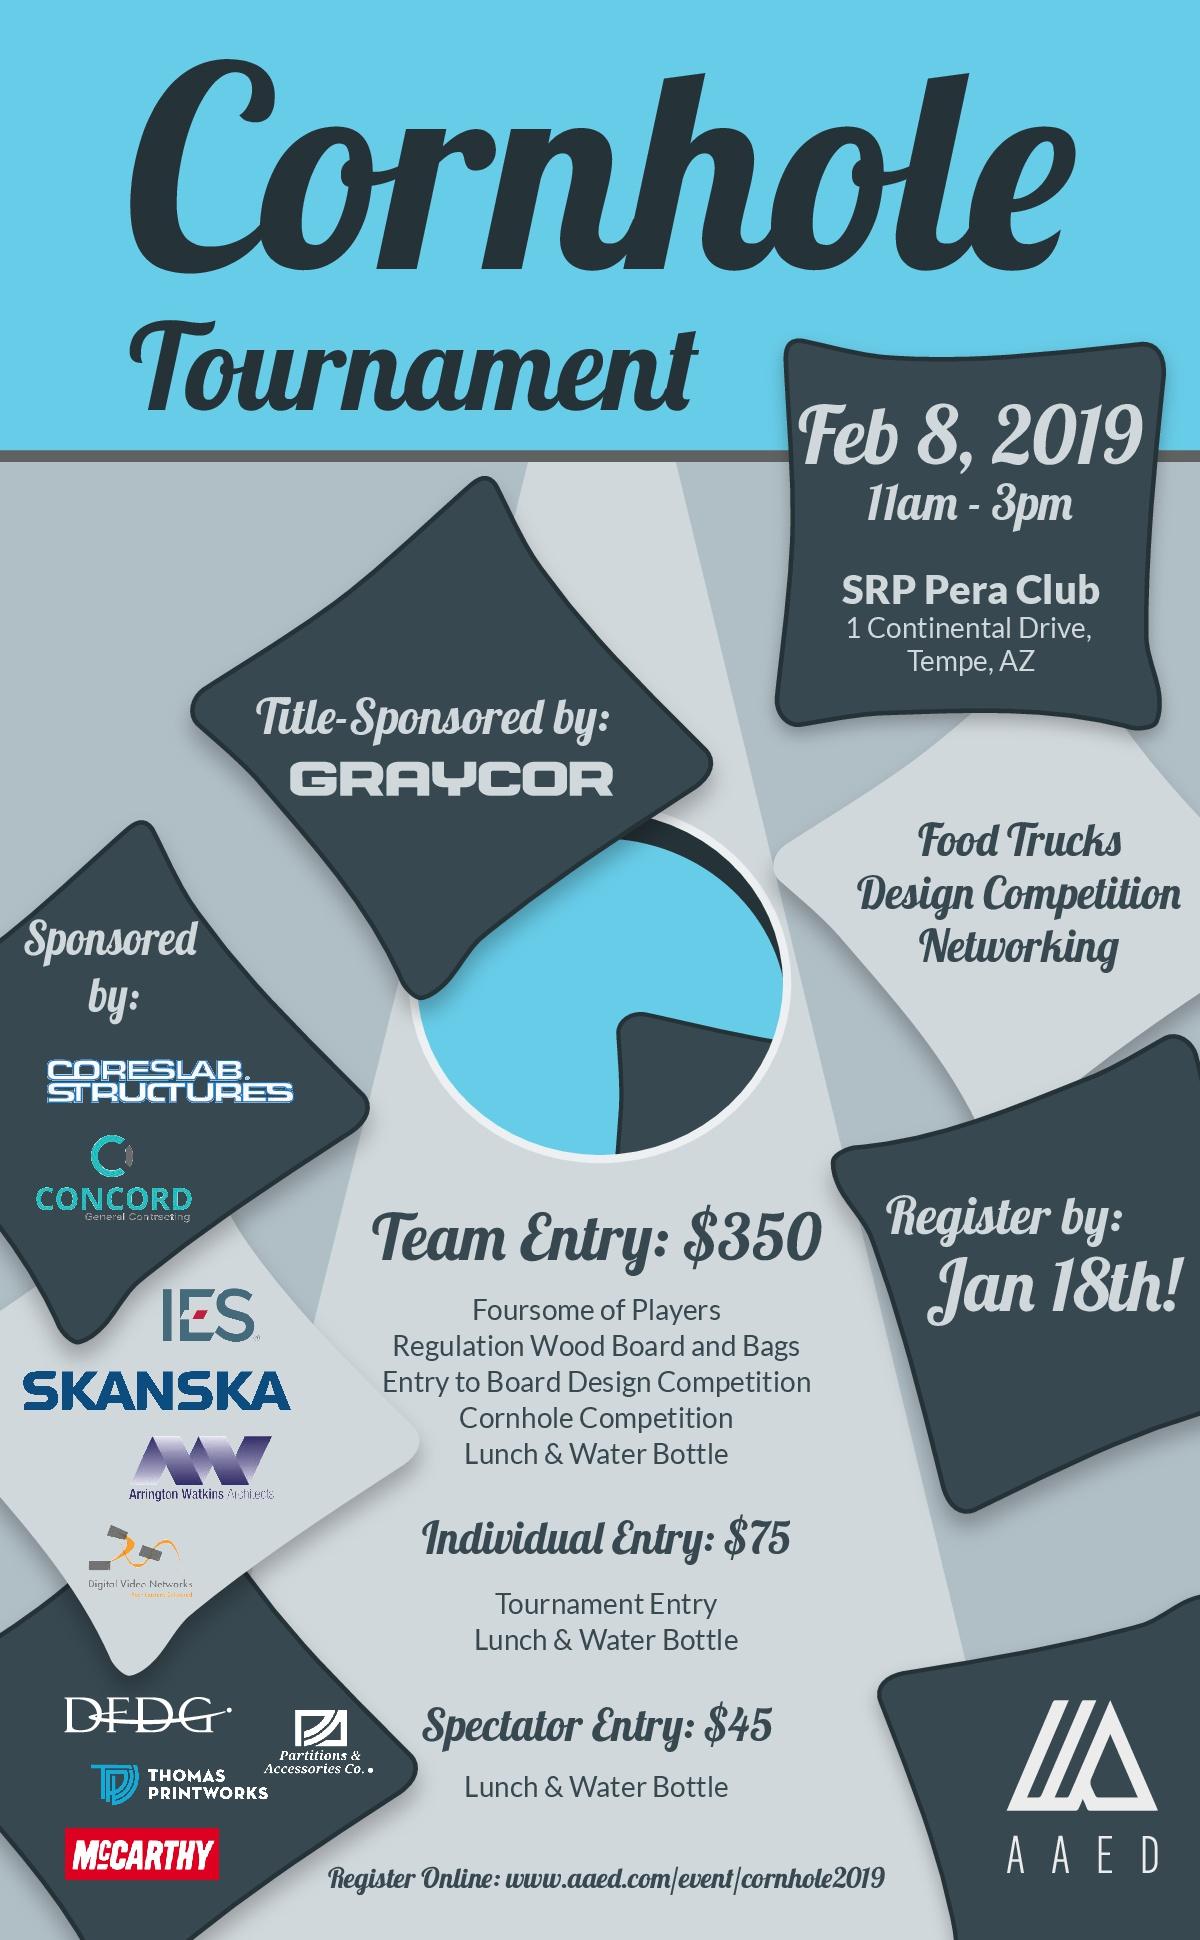 2019 AAED Cornhole Tournament @ SRP Pera Club